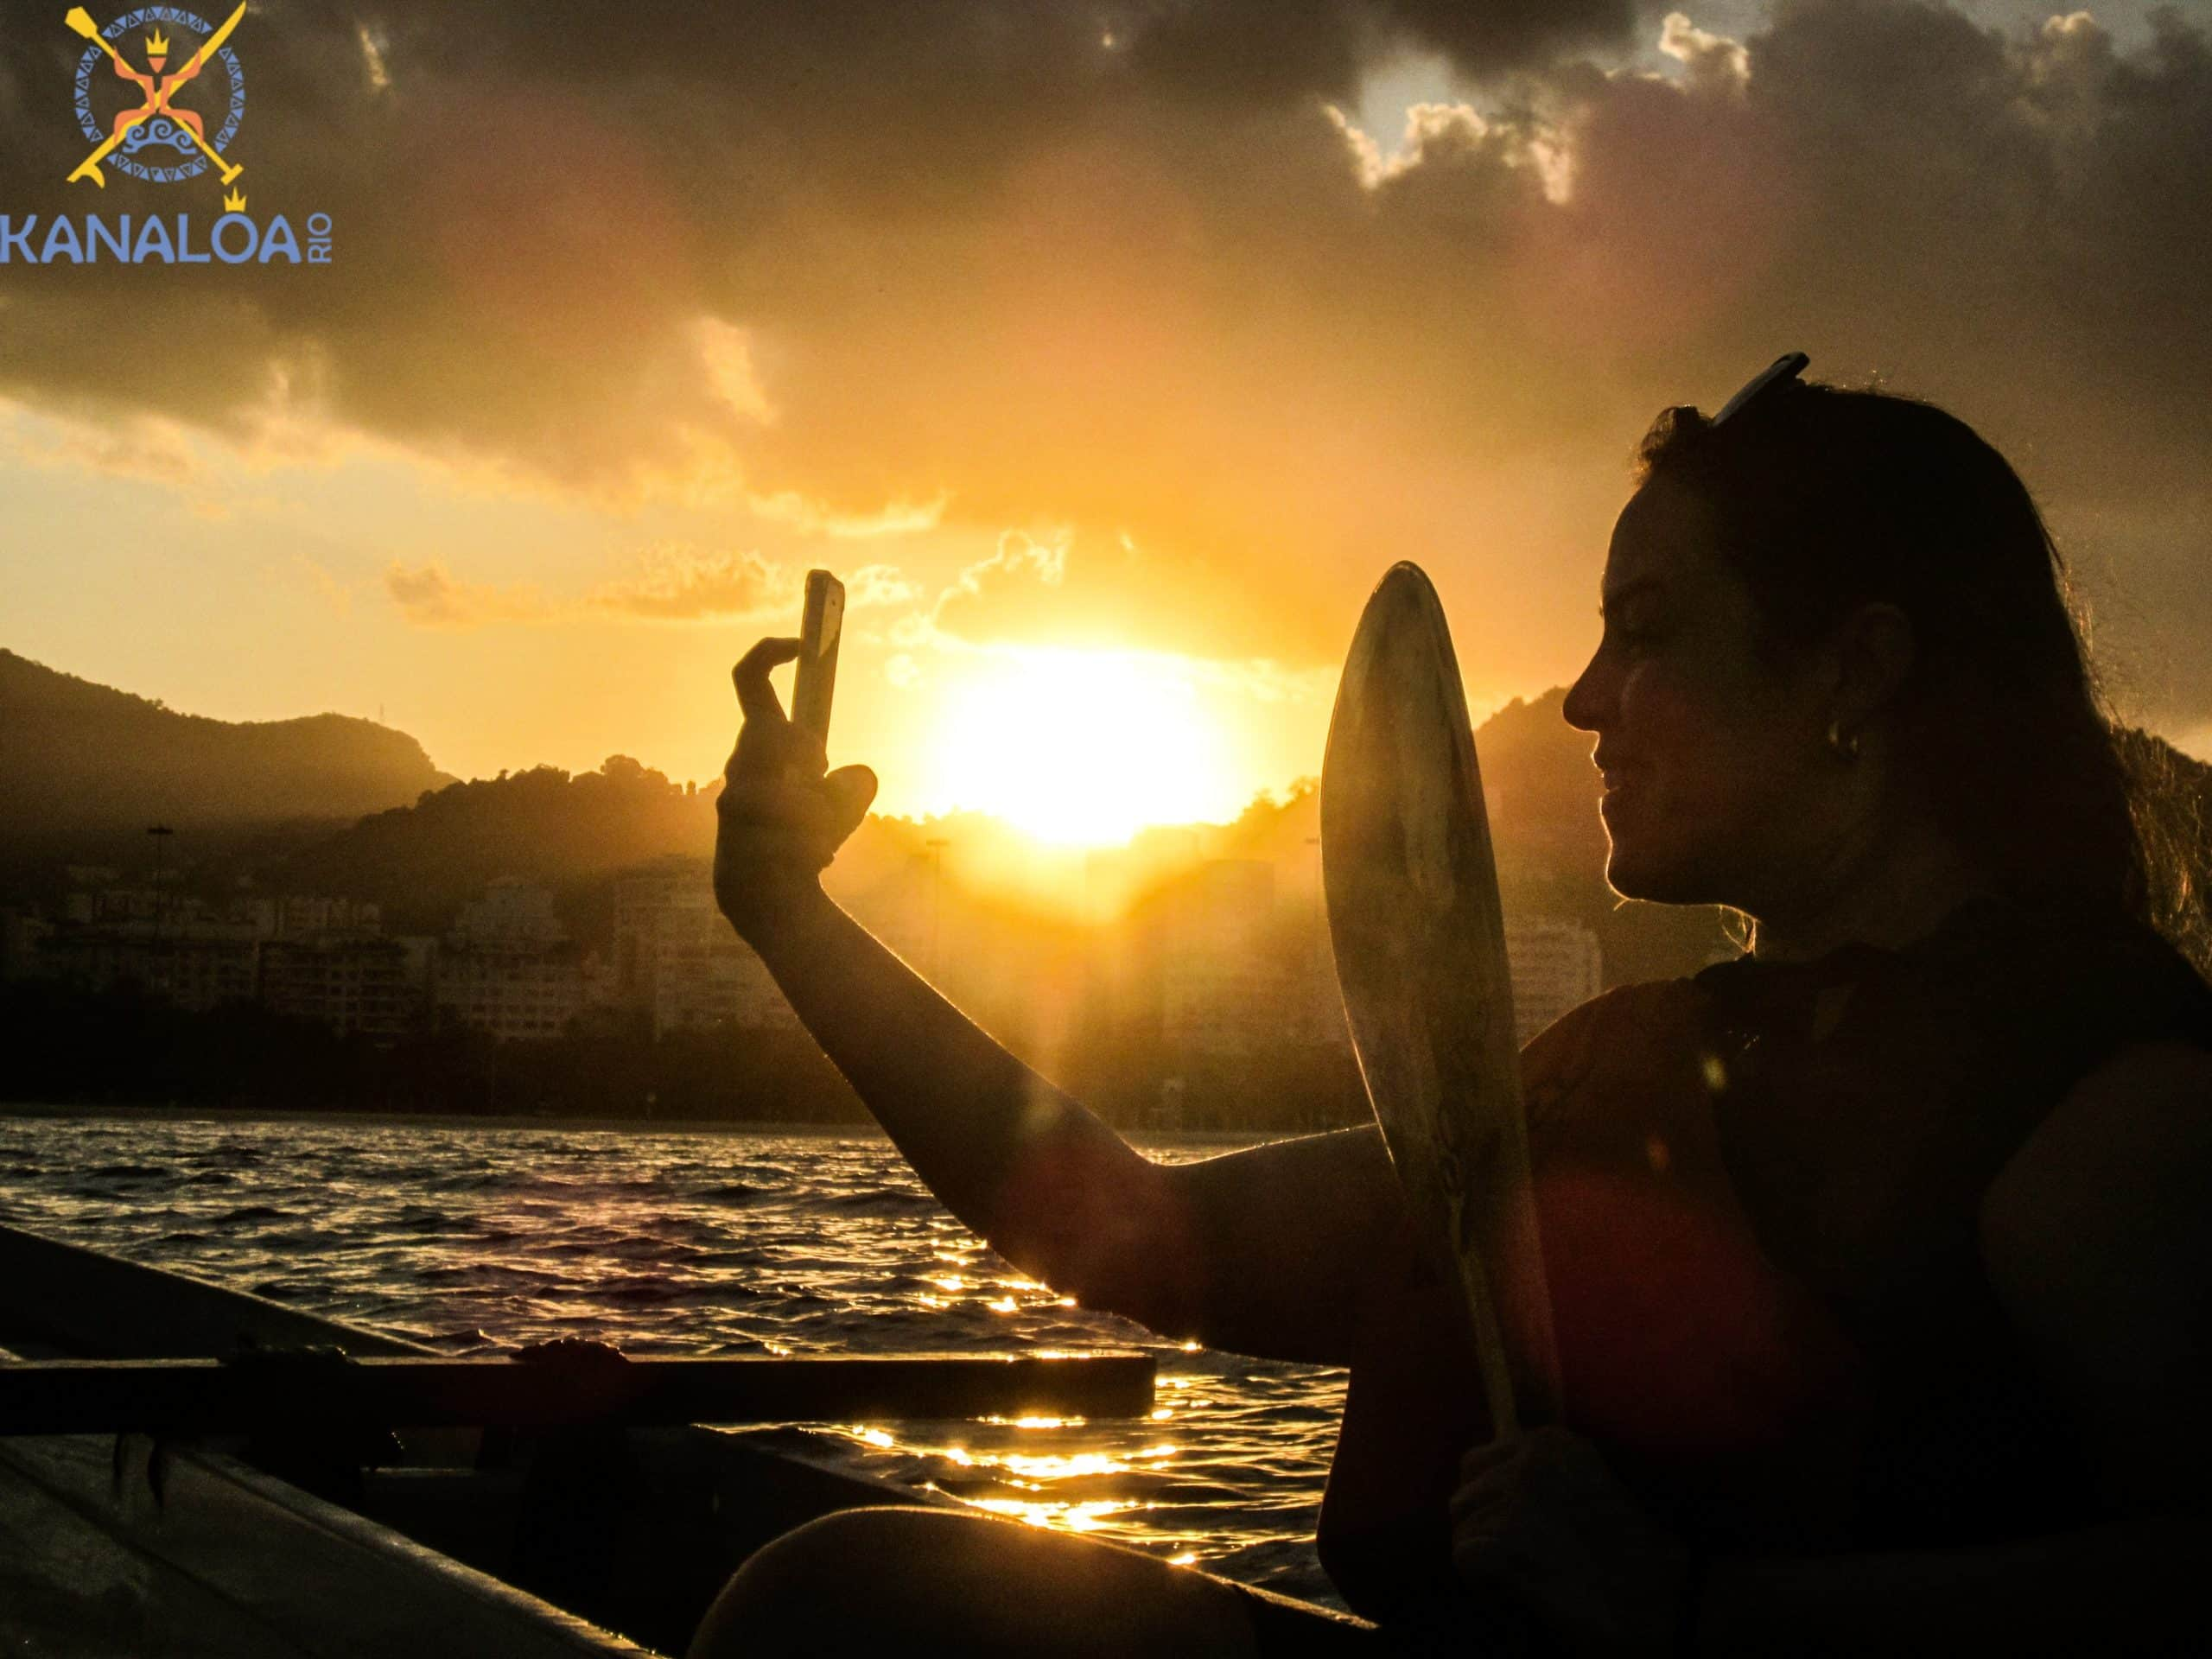 aula de canoa havaiana